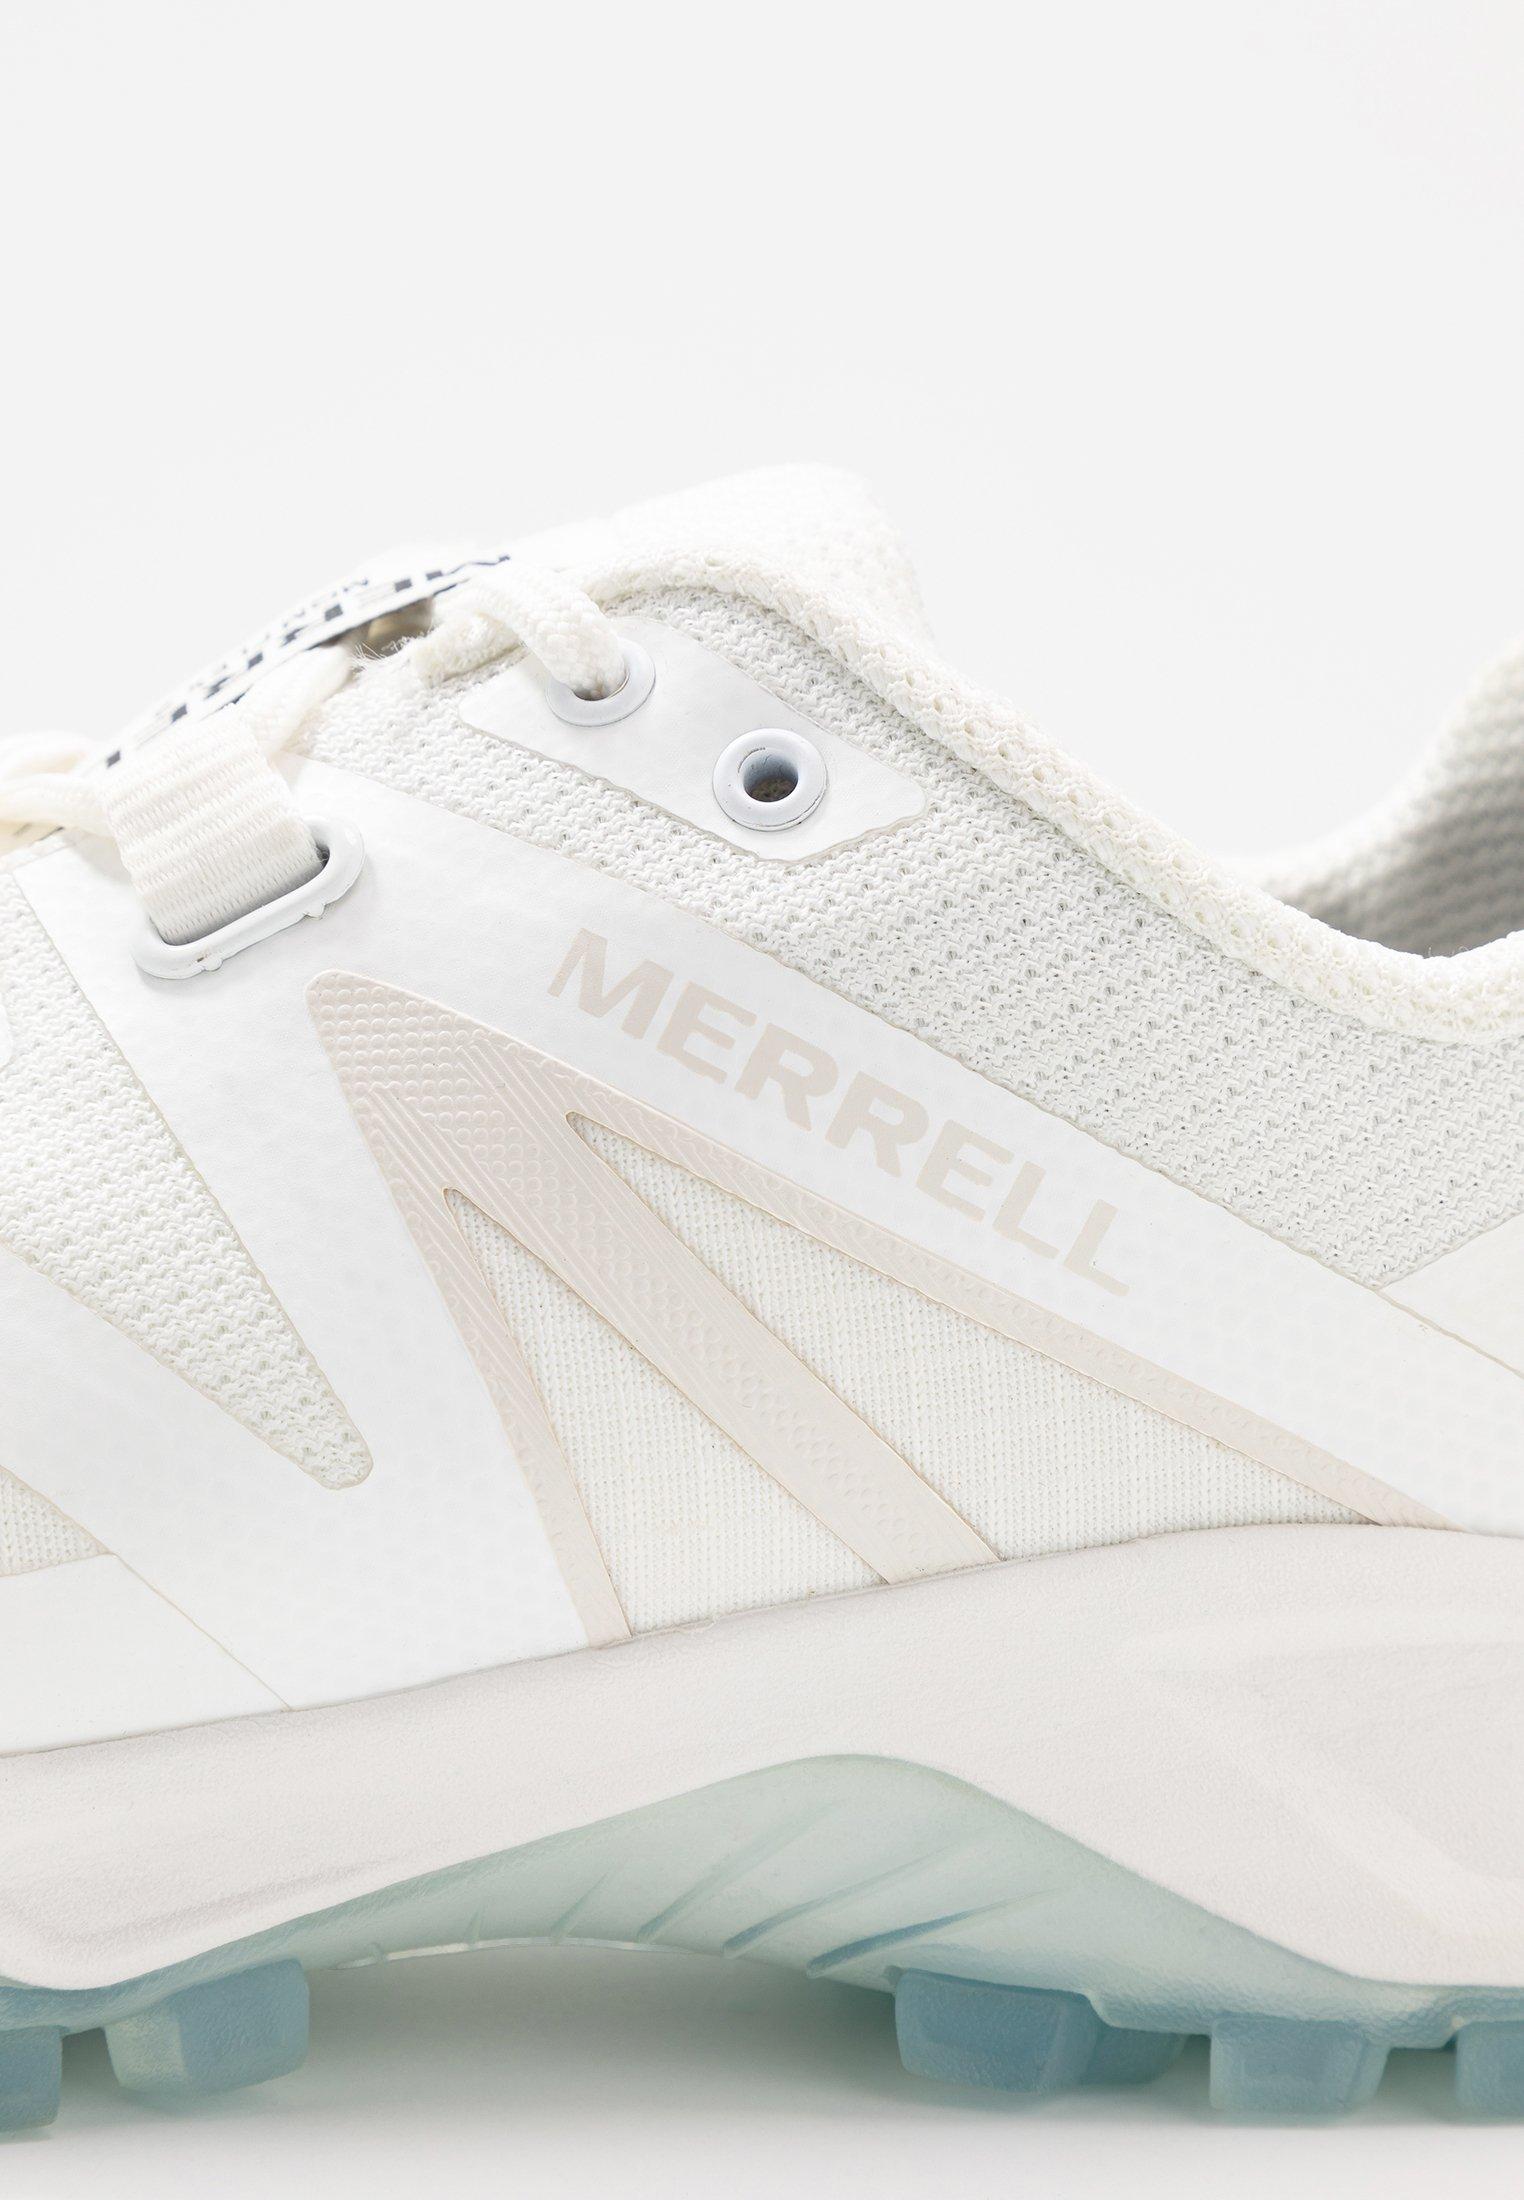 Merrell Mqm Flex 2 Gtx - Hikingskor White